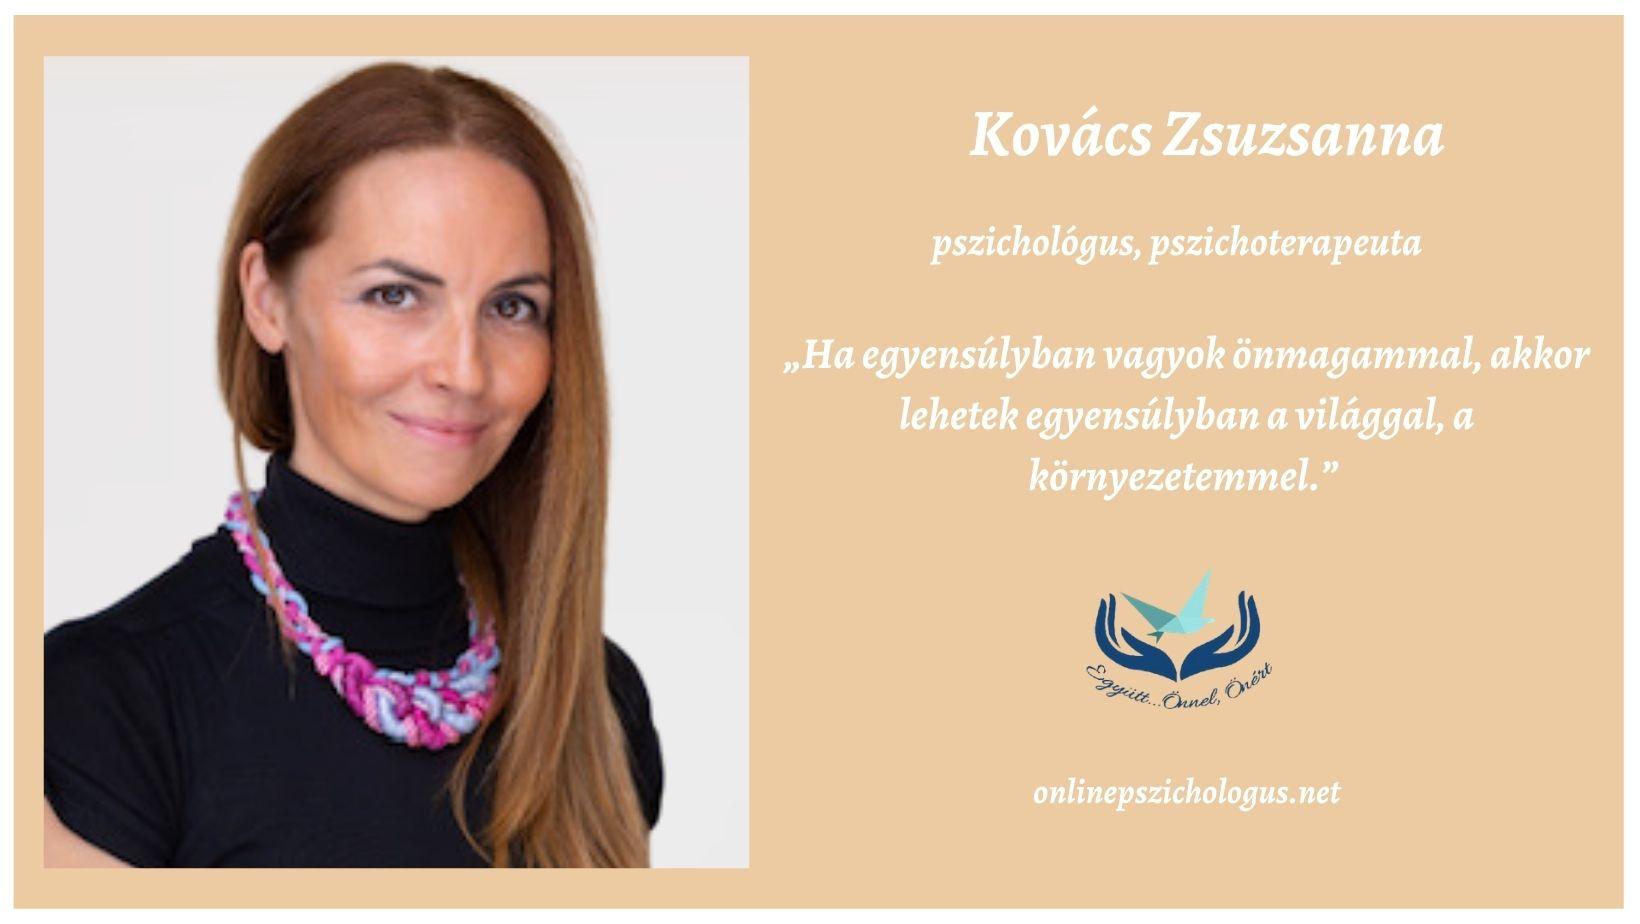 Interjú Kovács Zsuzsanna pszichoterapeutával